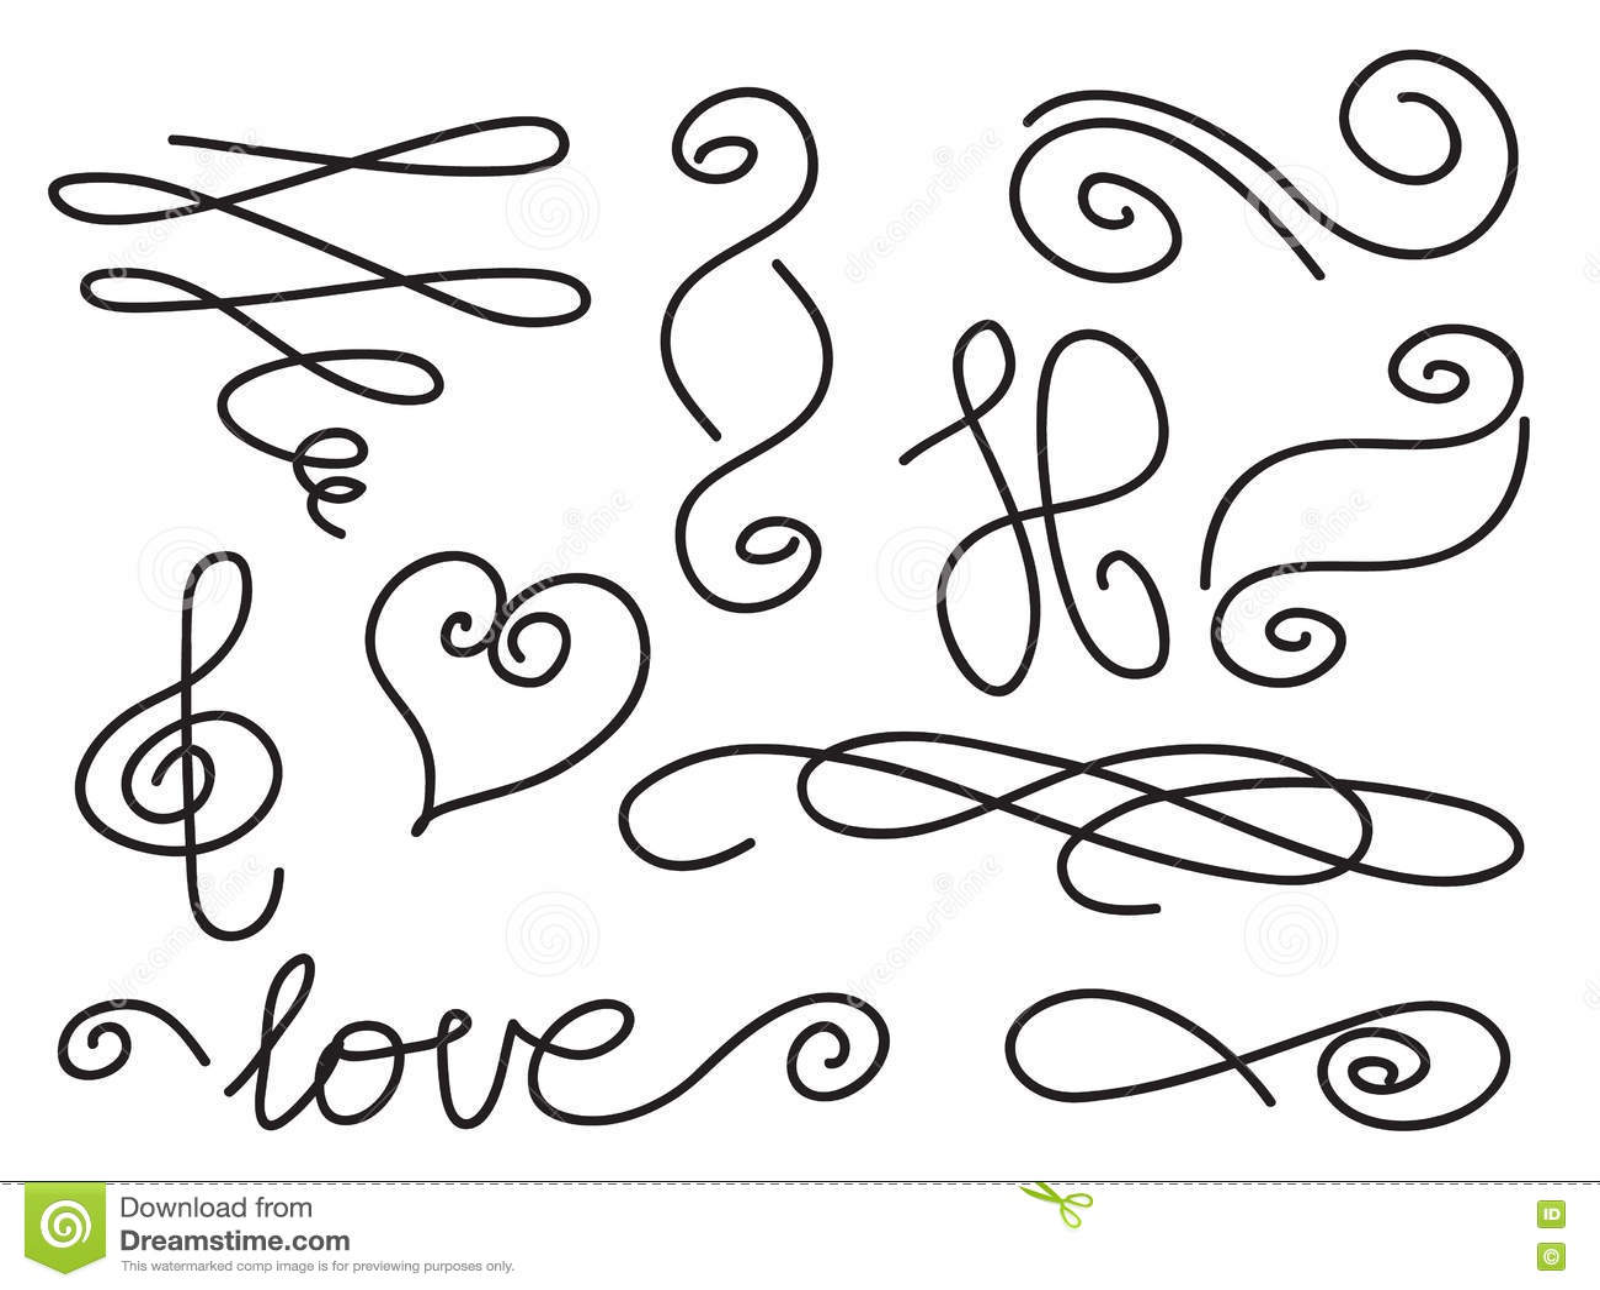 Letter End Swirls Stock Vector Illustration Of Book